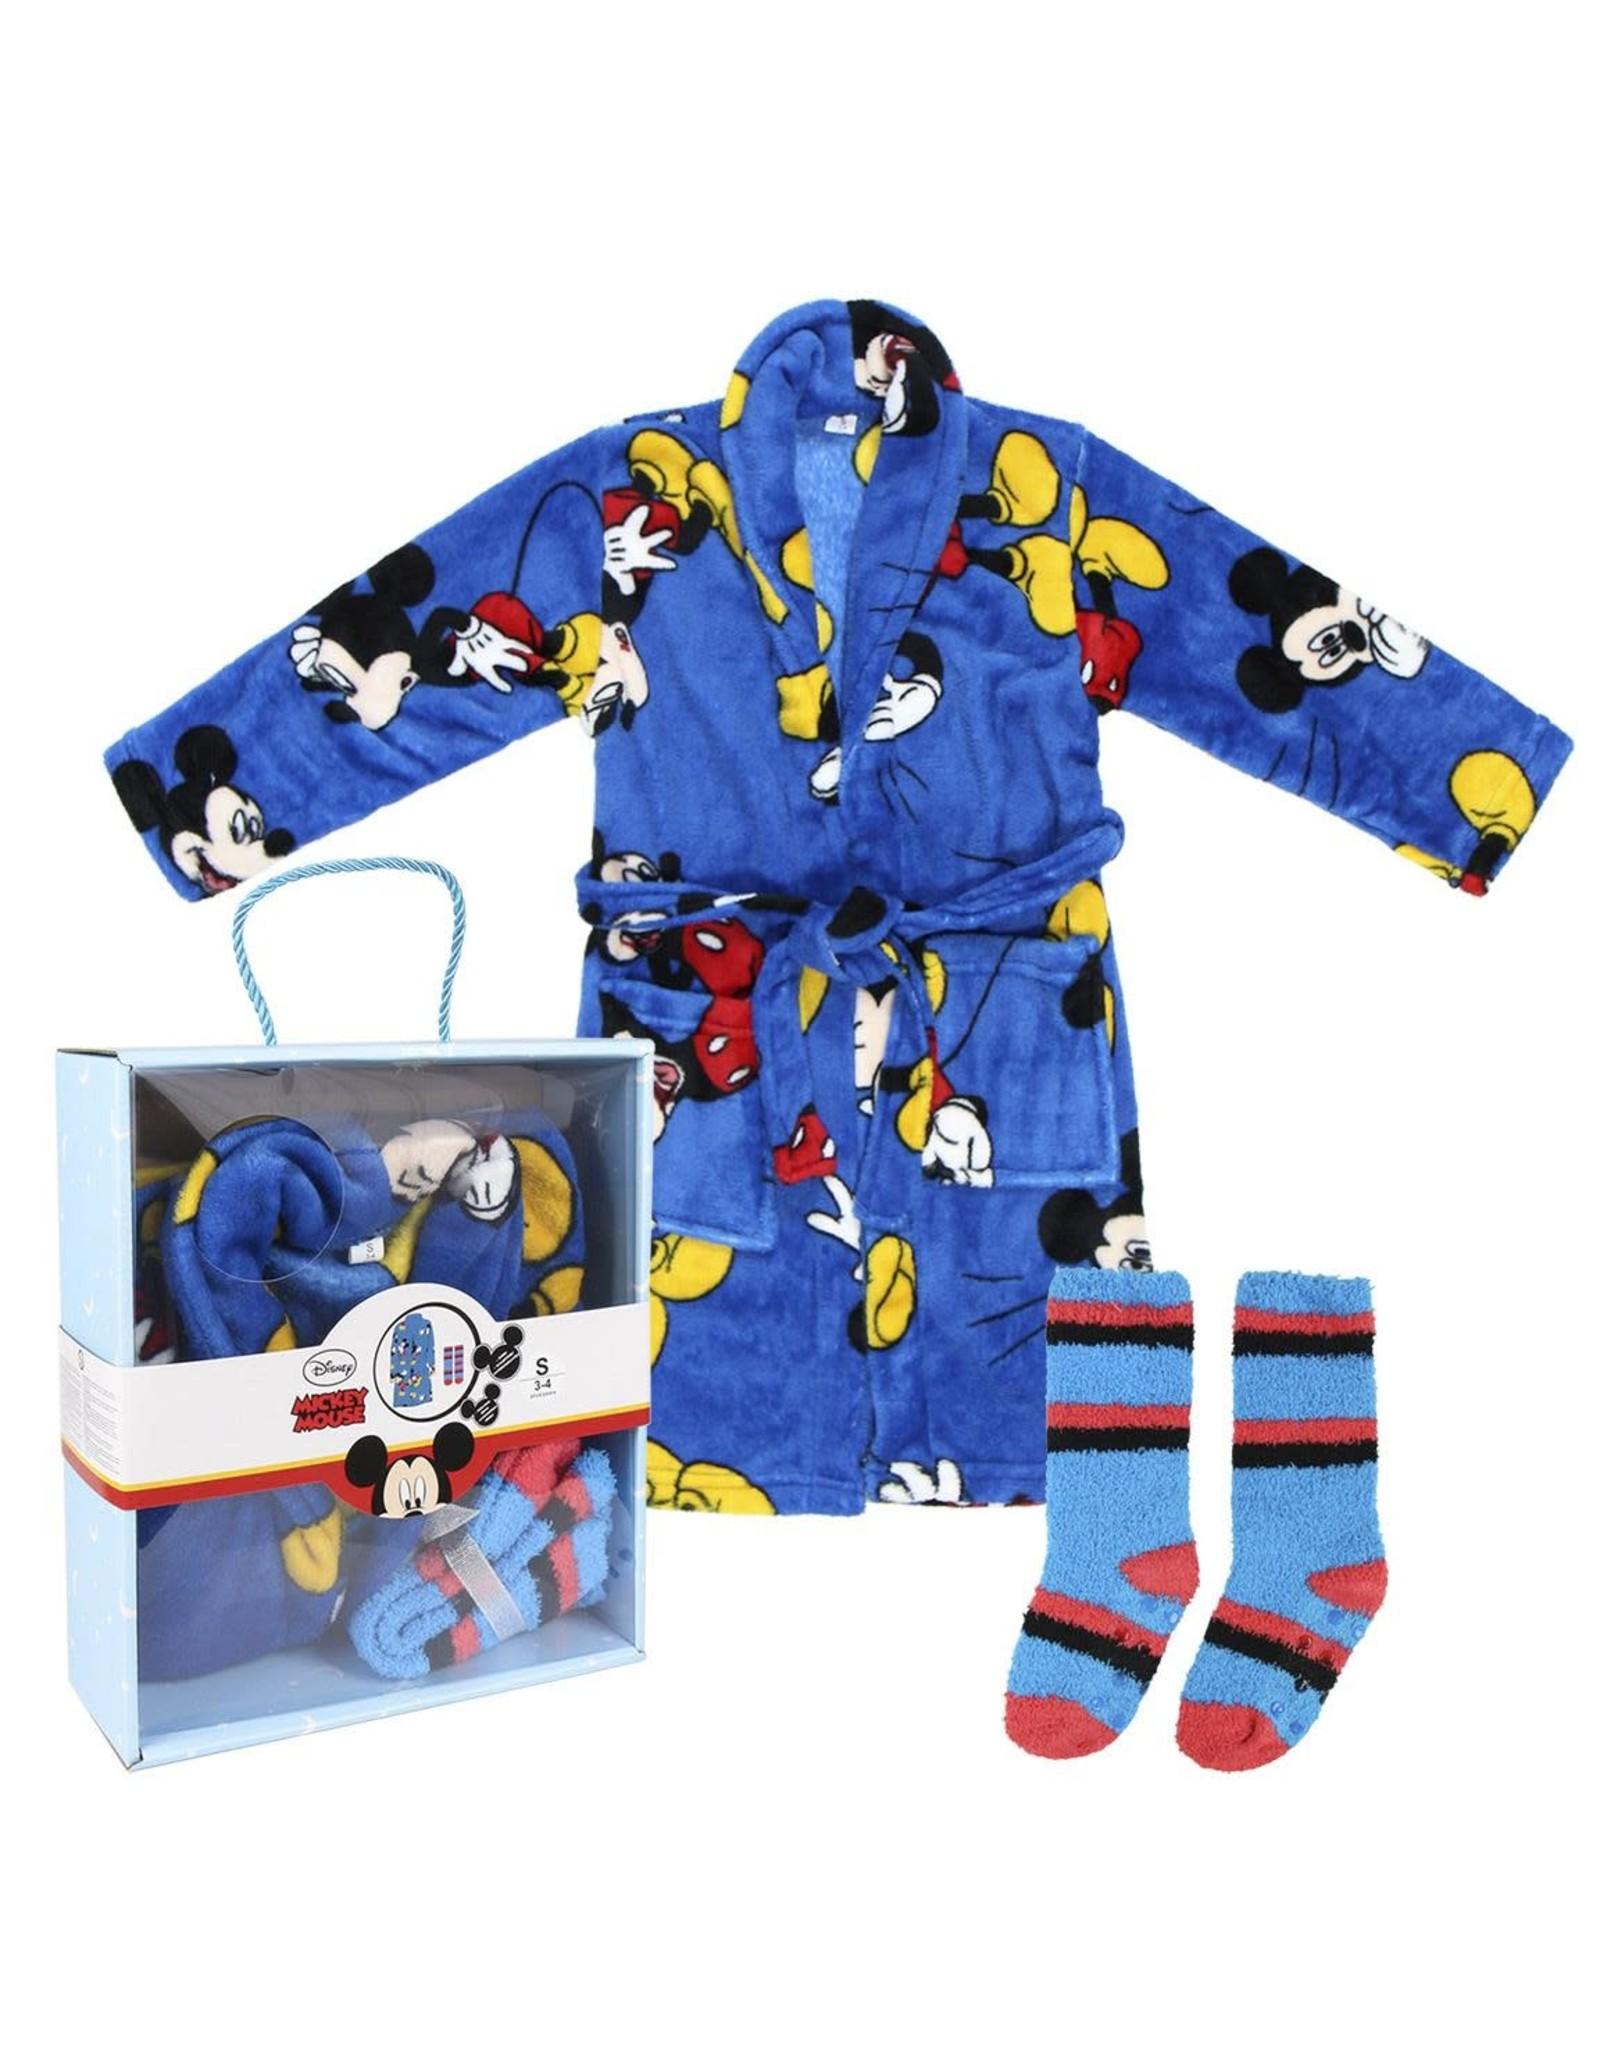 MICKEY MOUSE Gift Set Bathrobe & Socks 3/4